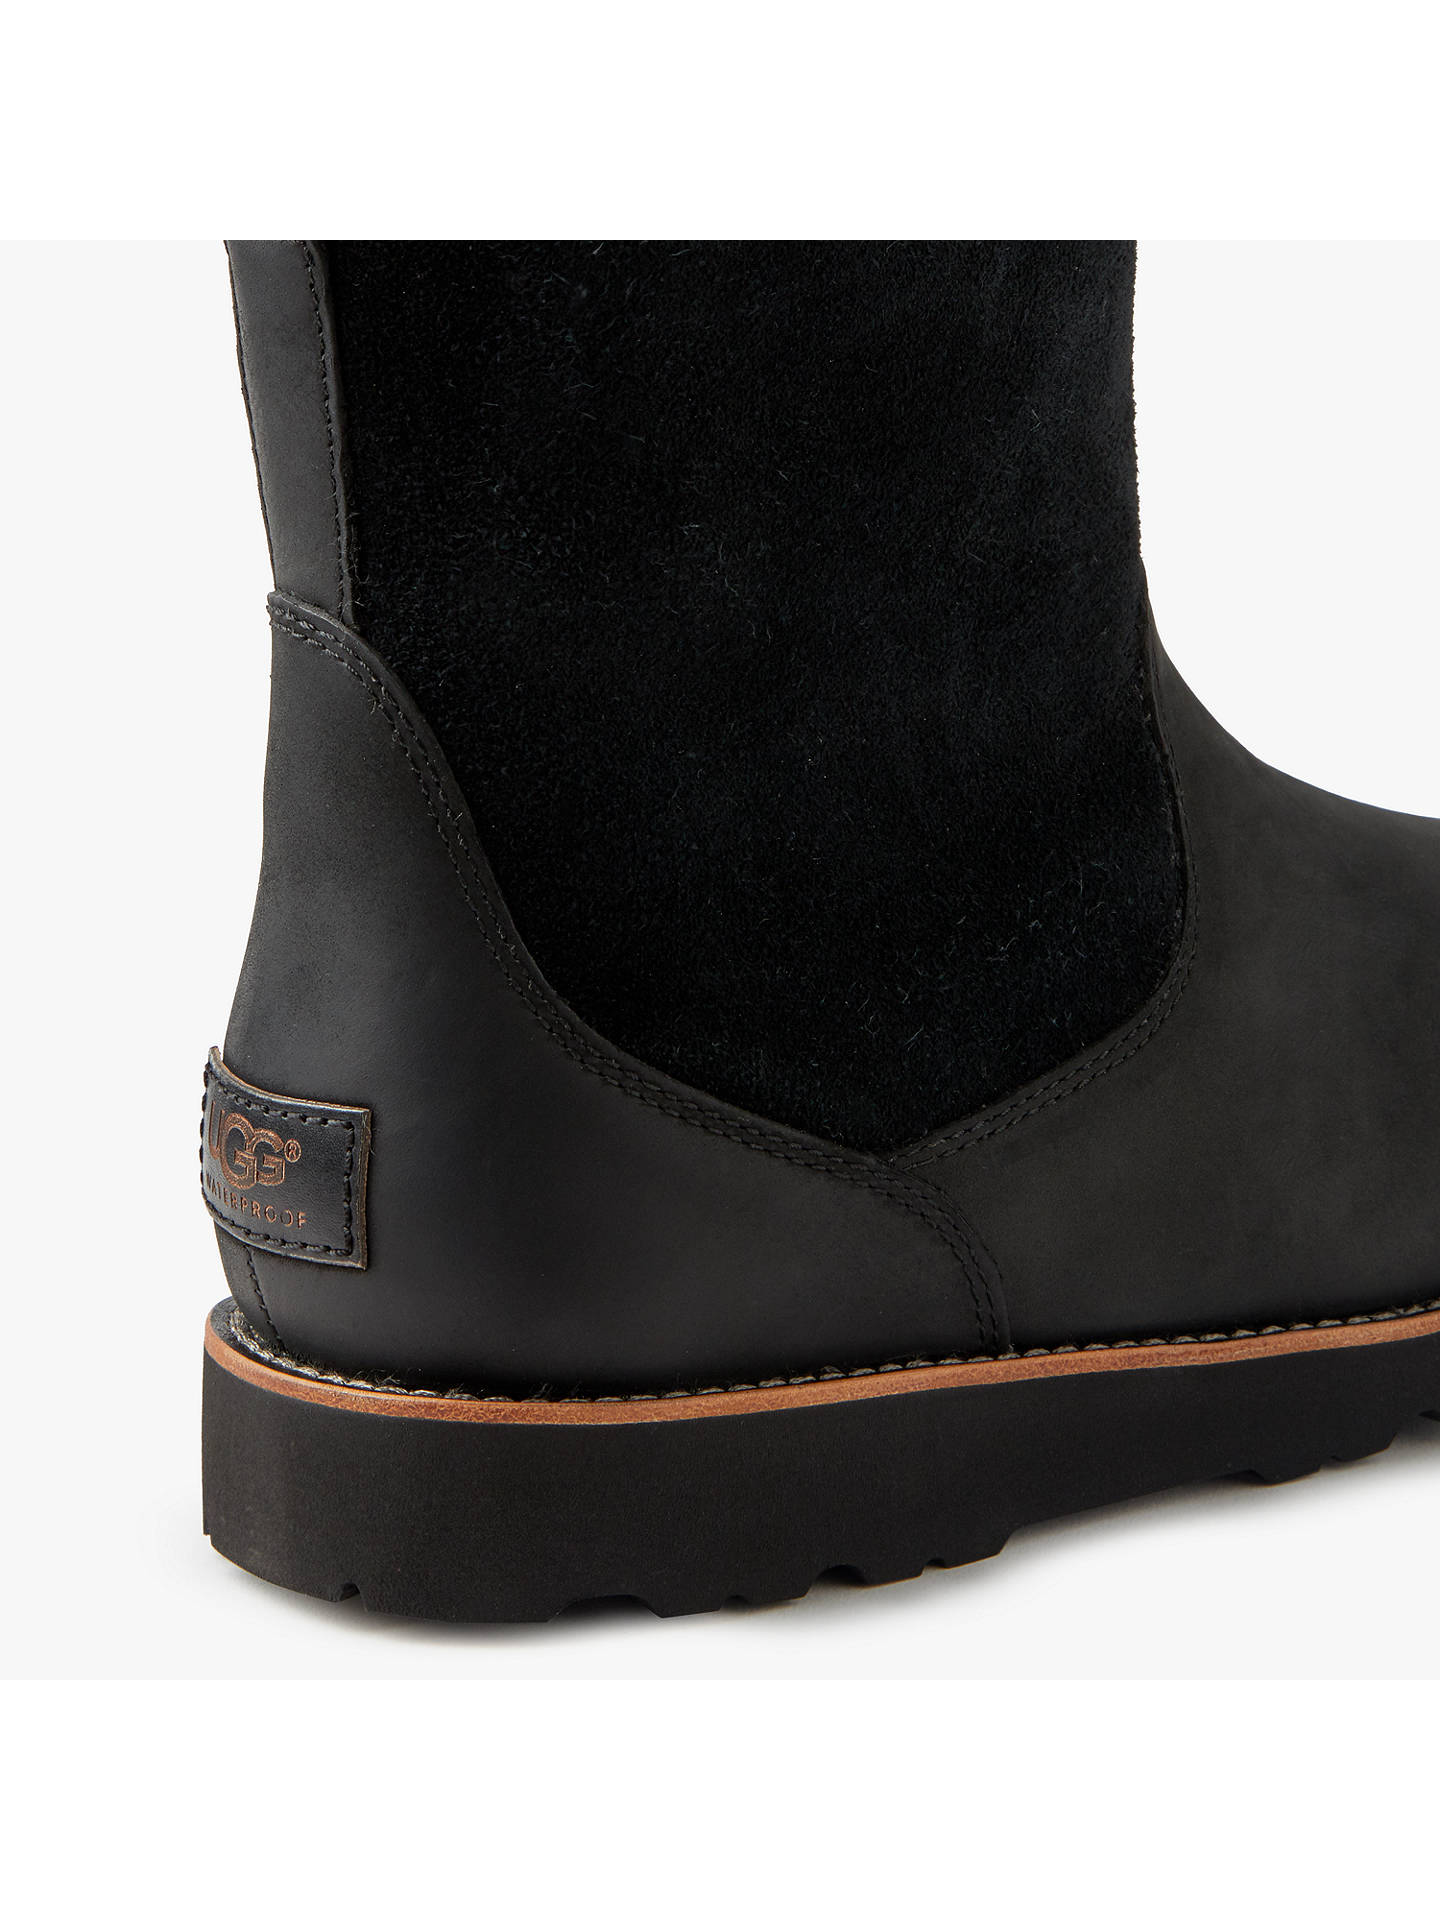 11ff33ef572 UGG Hendren Waterproof Boots at John Lewis & Partners